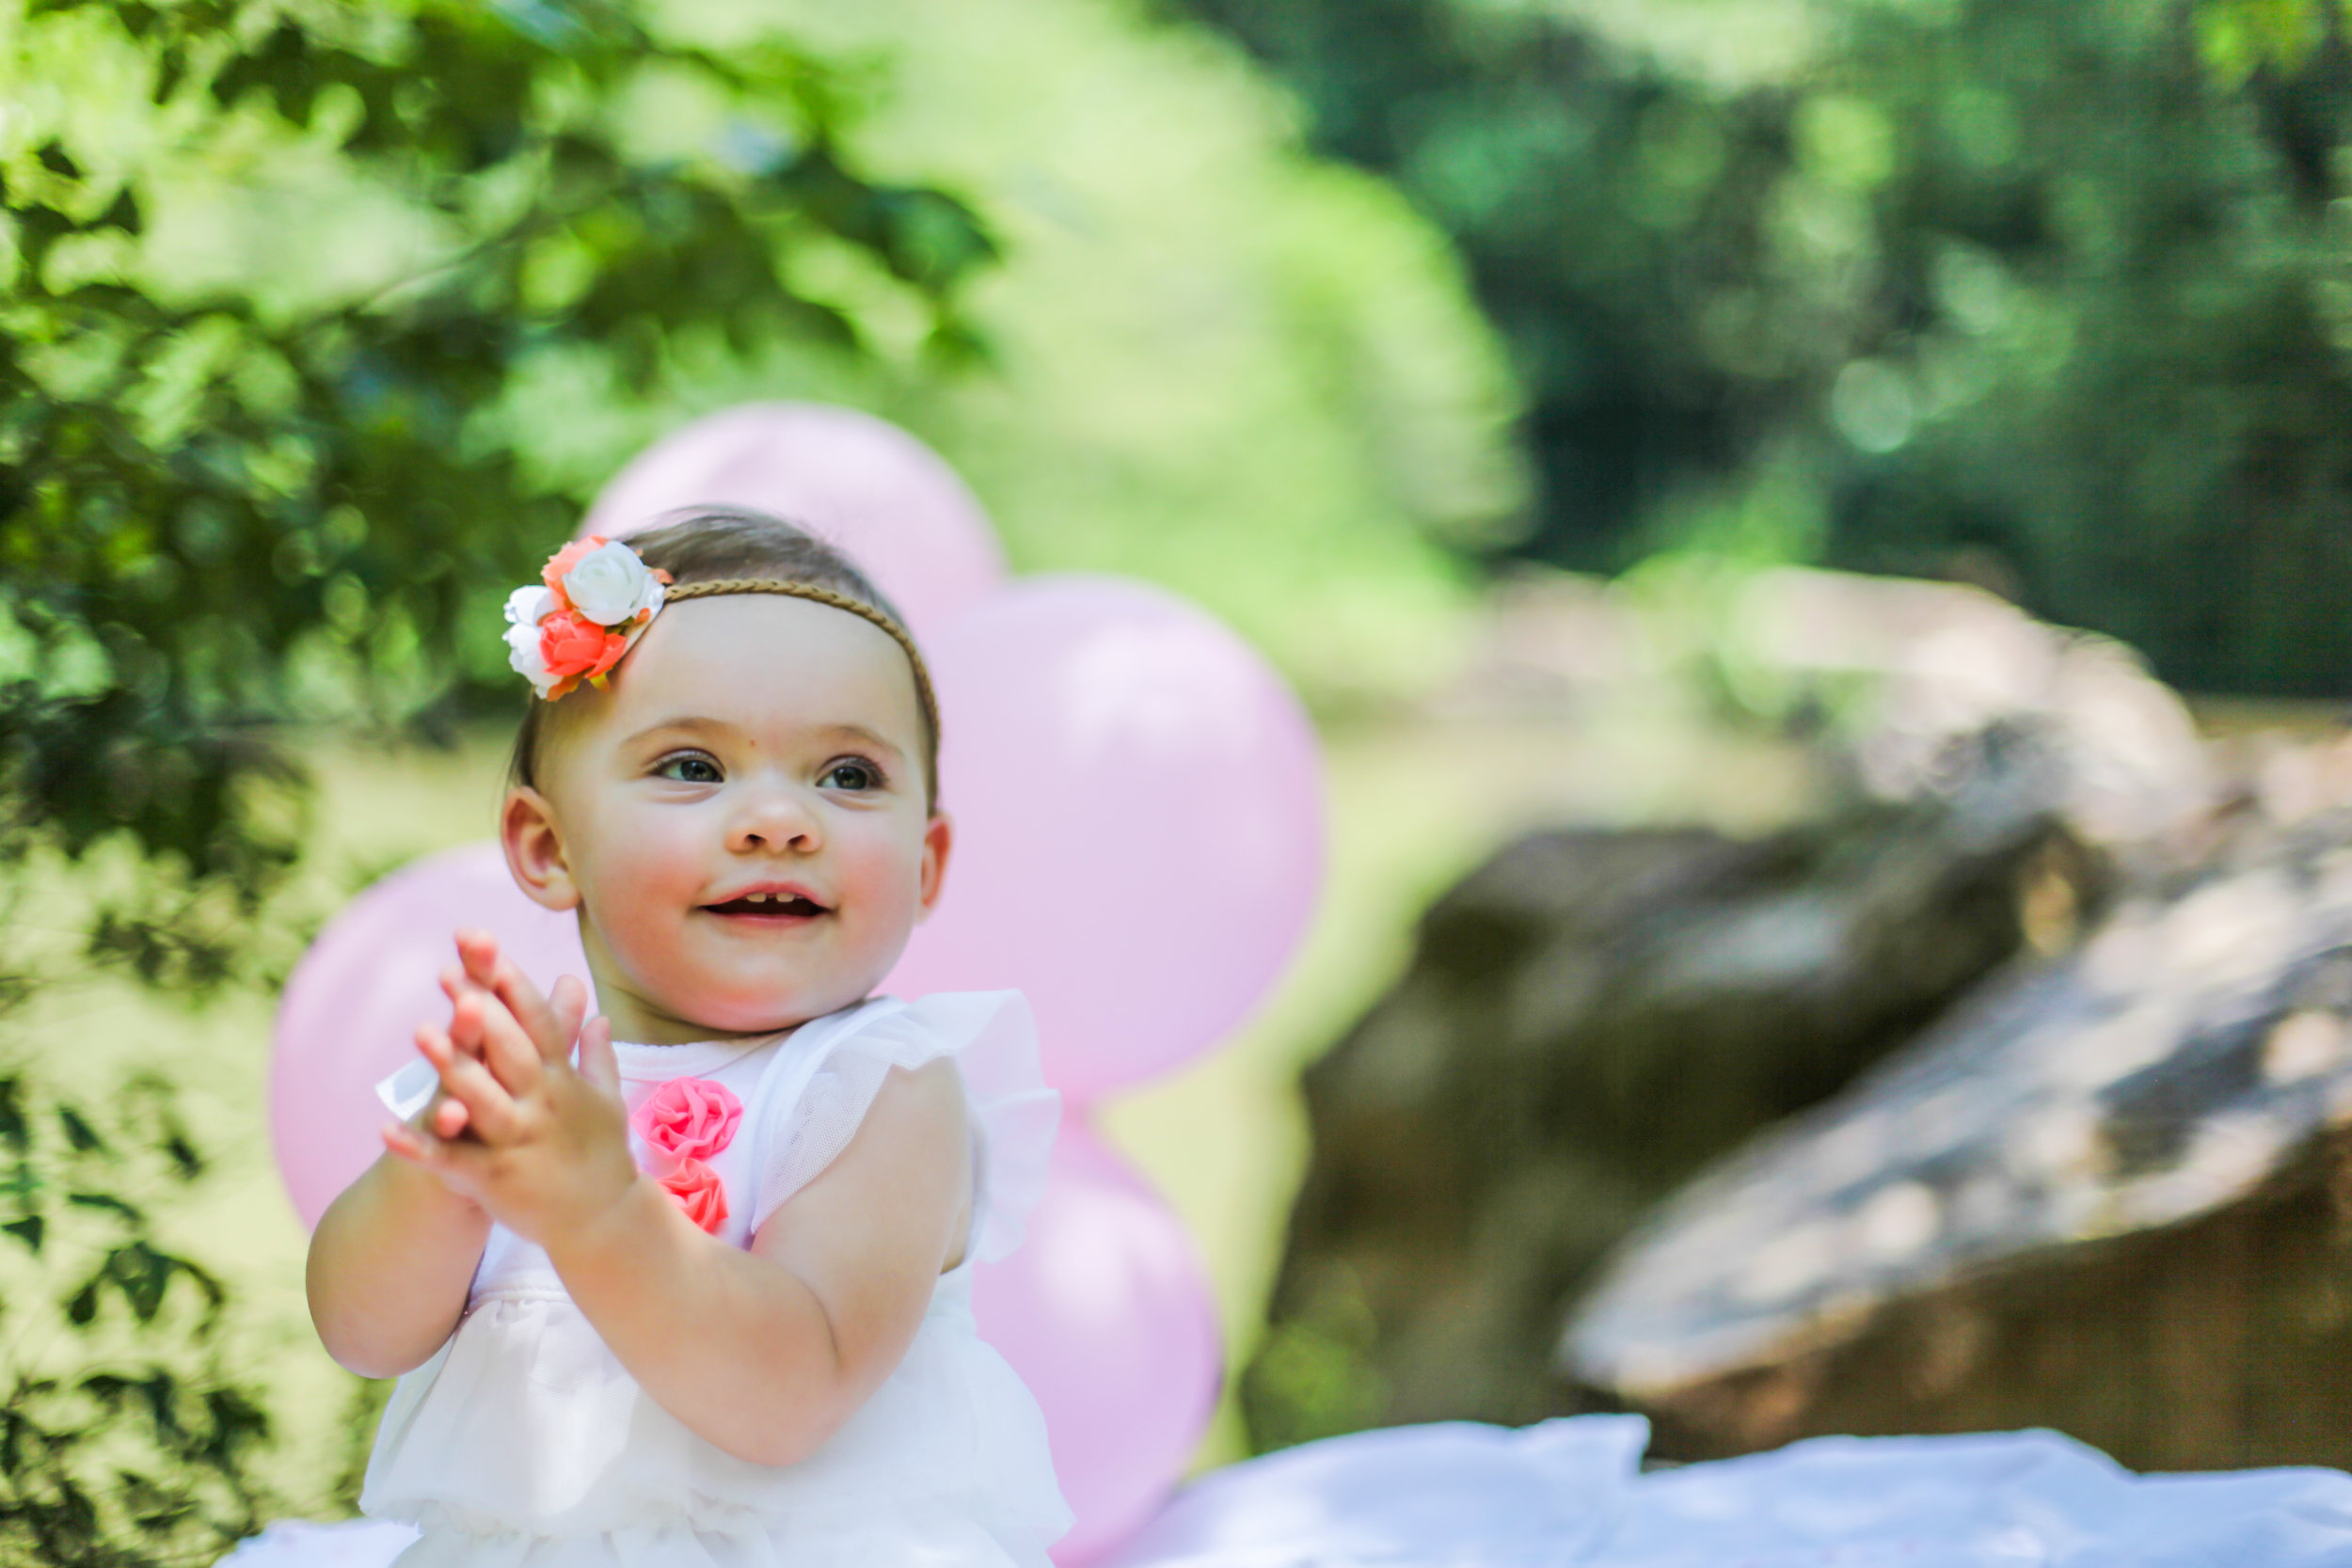 woodstock baby photography angela elliott-77.jpg